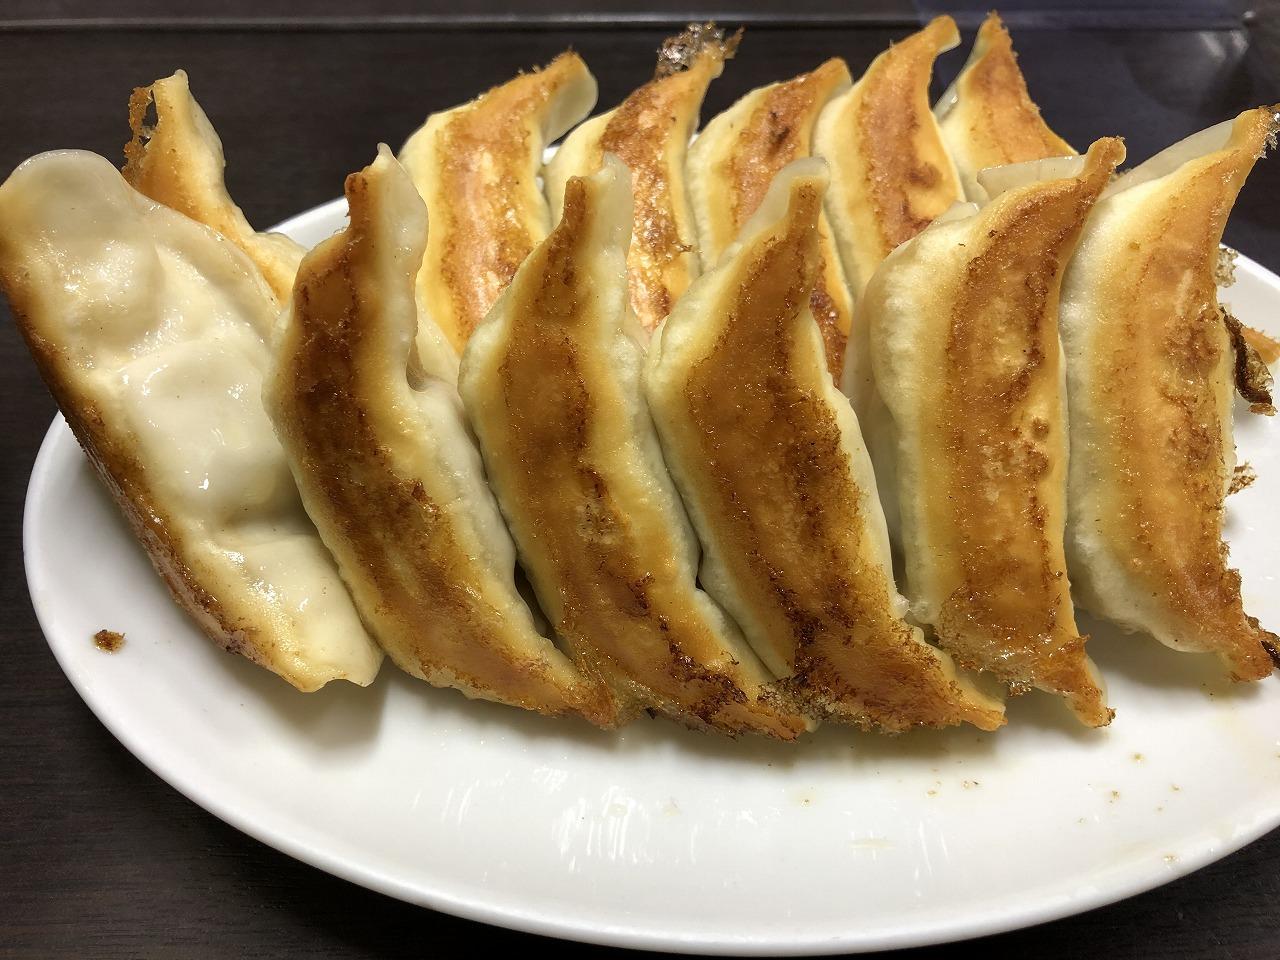 香蘭本店の焼餃子